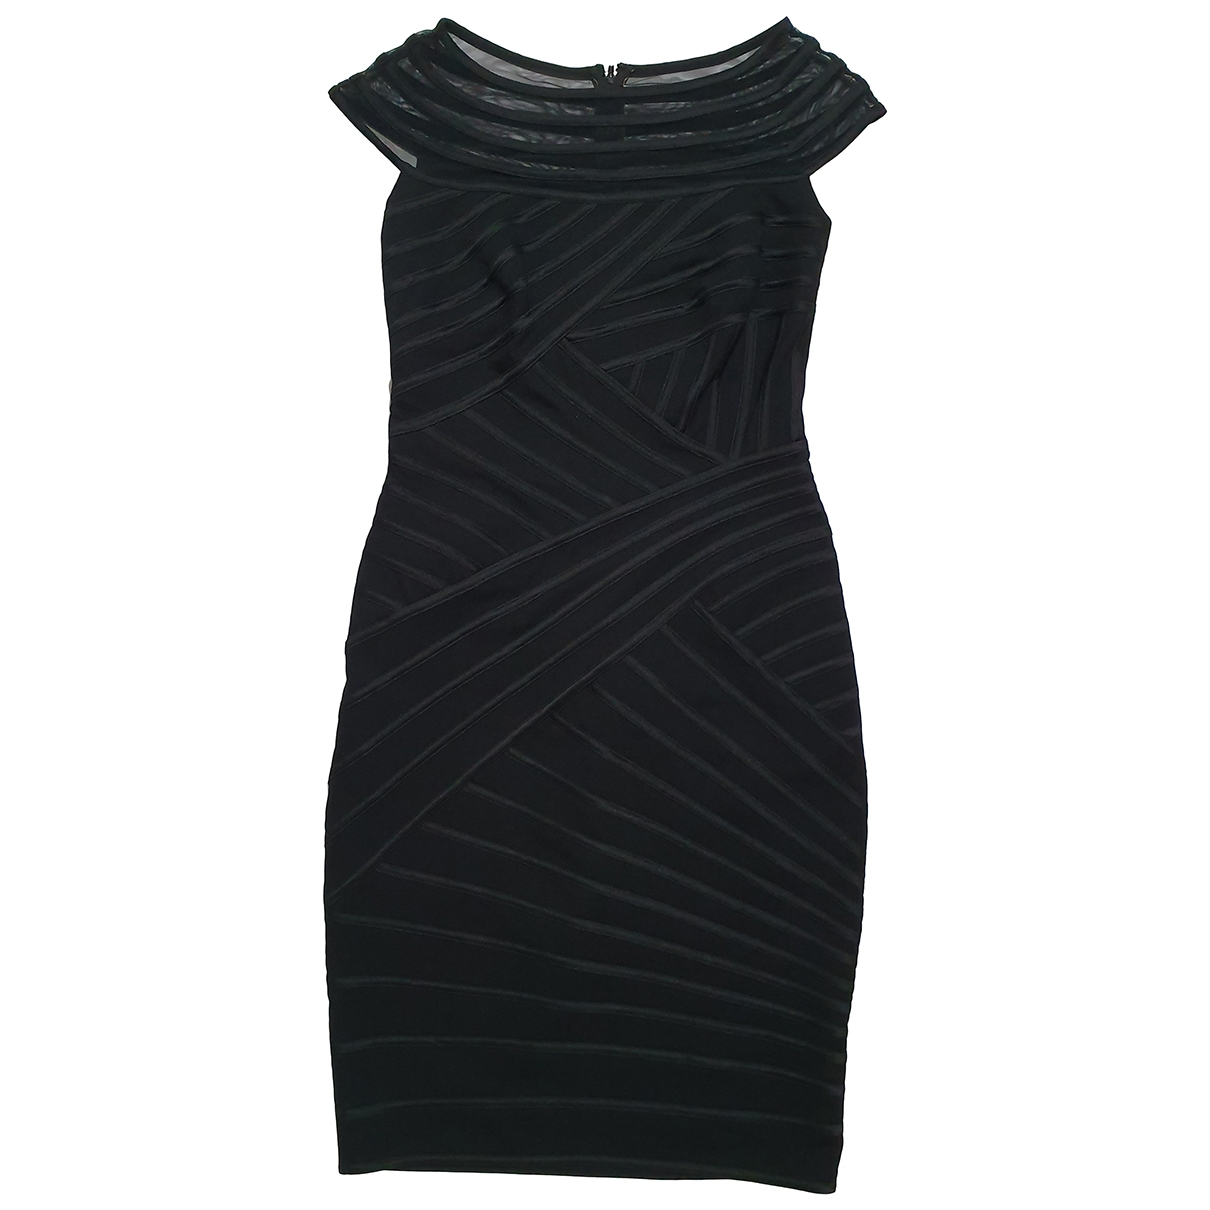 Tadashi Shoji \N Black dress for Women M International